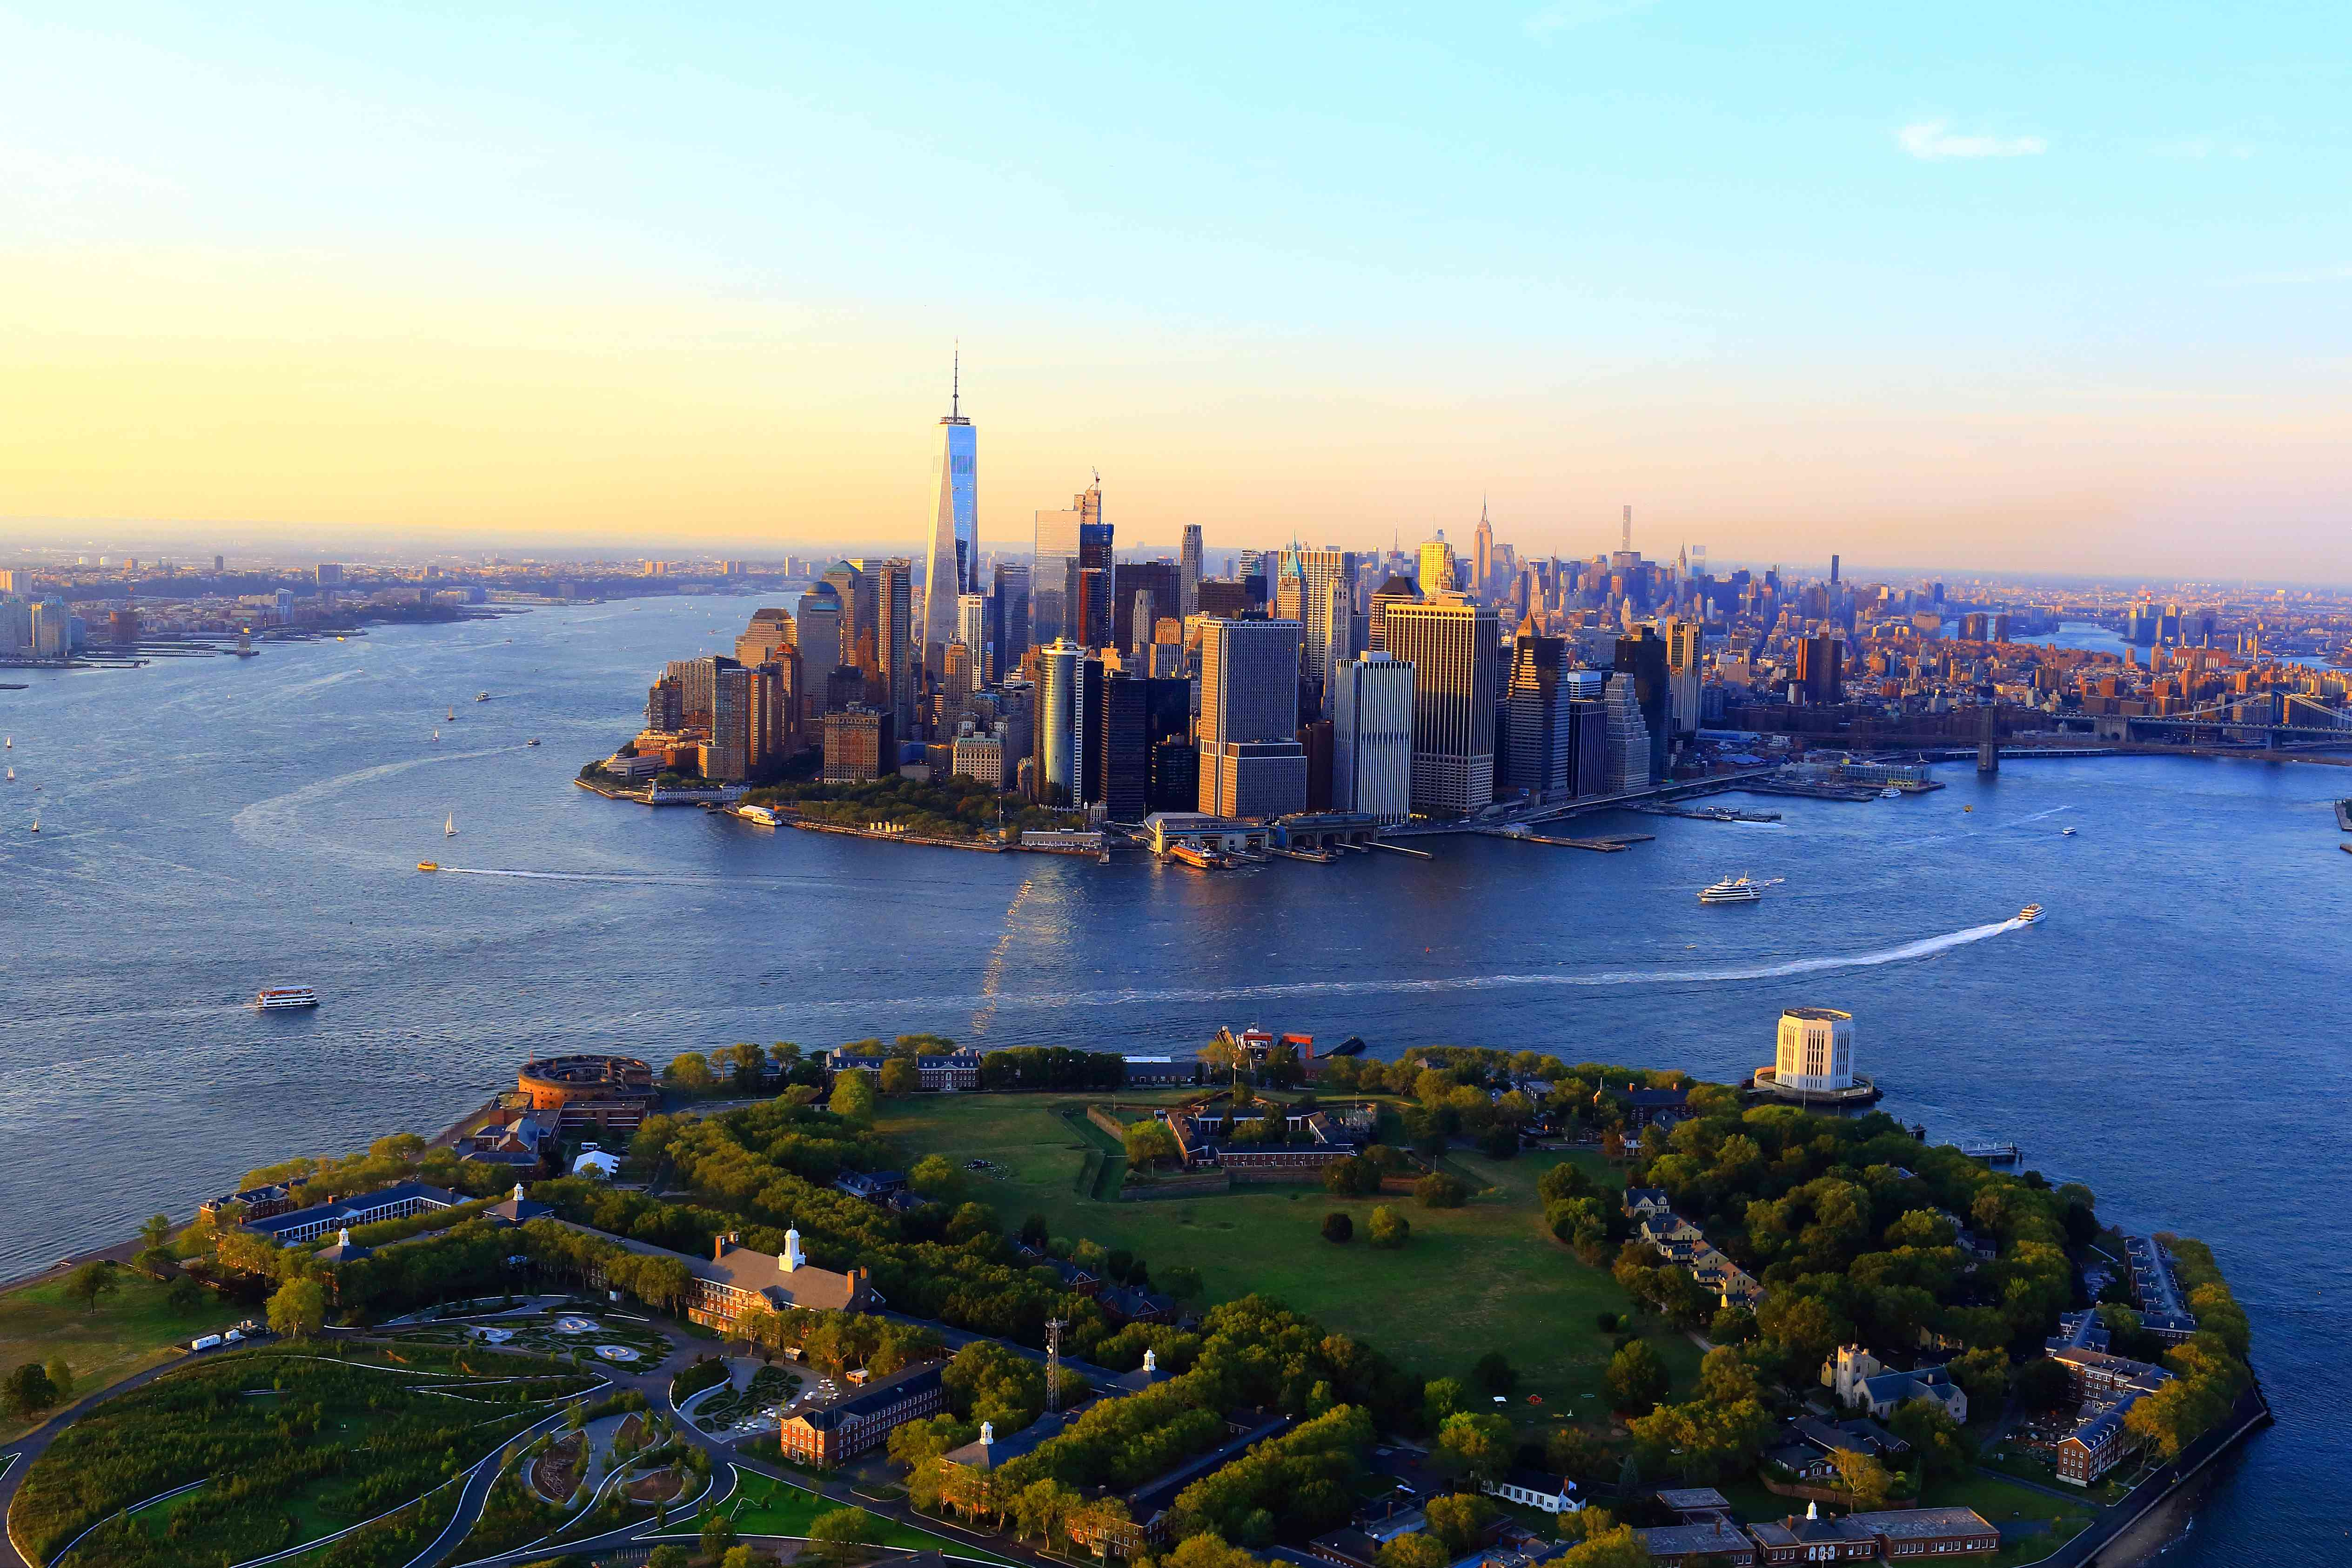 Governors island and Manhattan